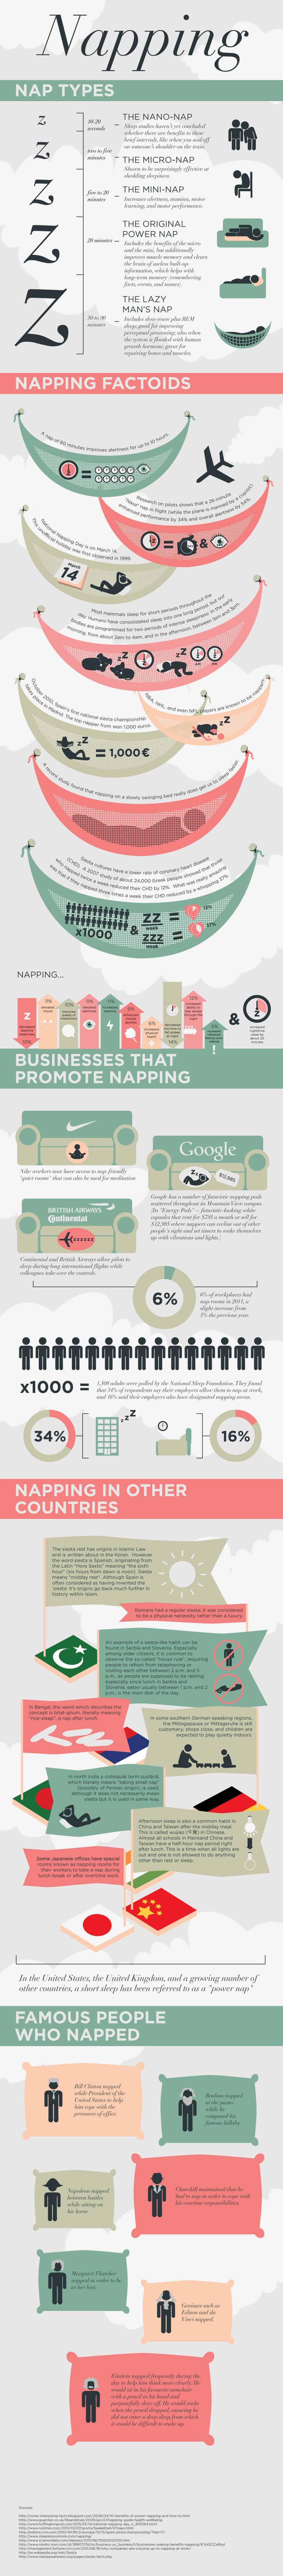 infographie : la sieste